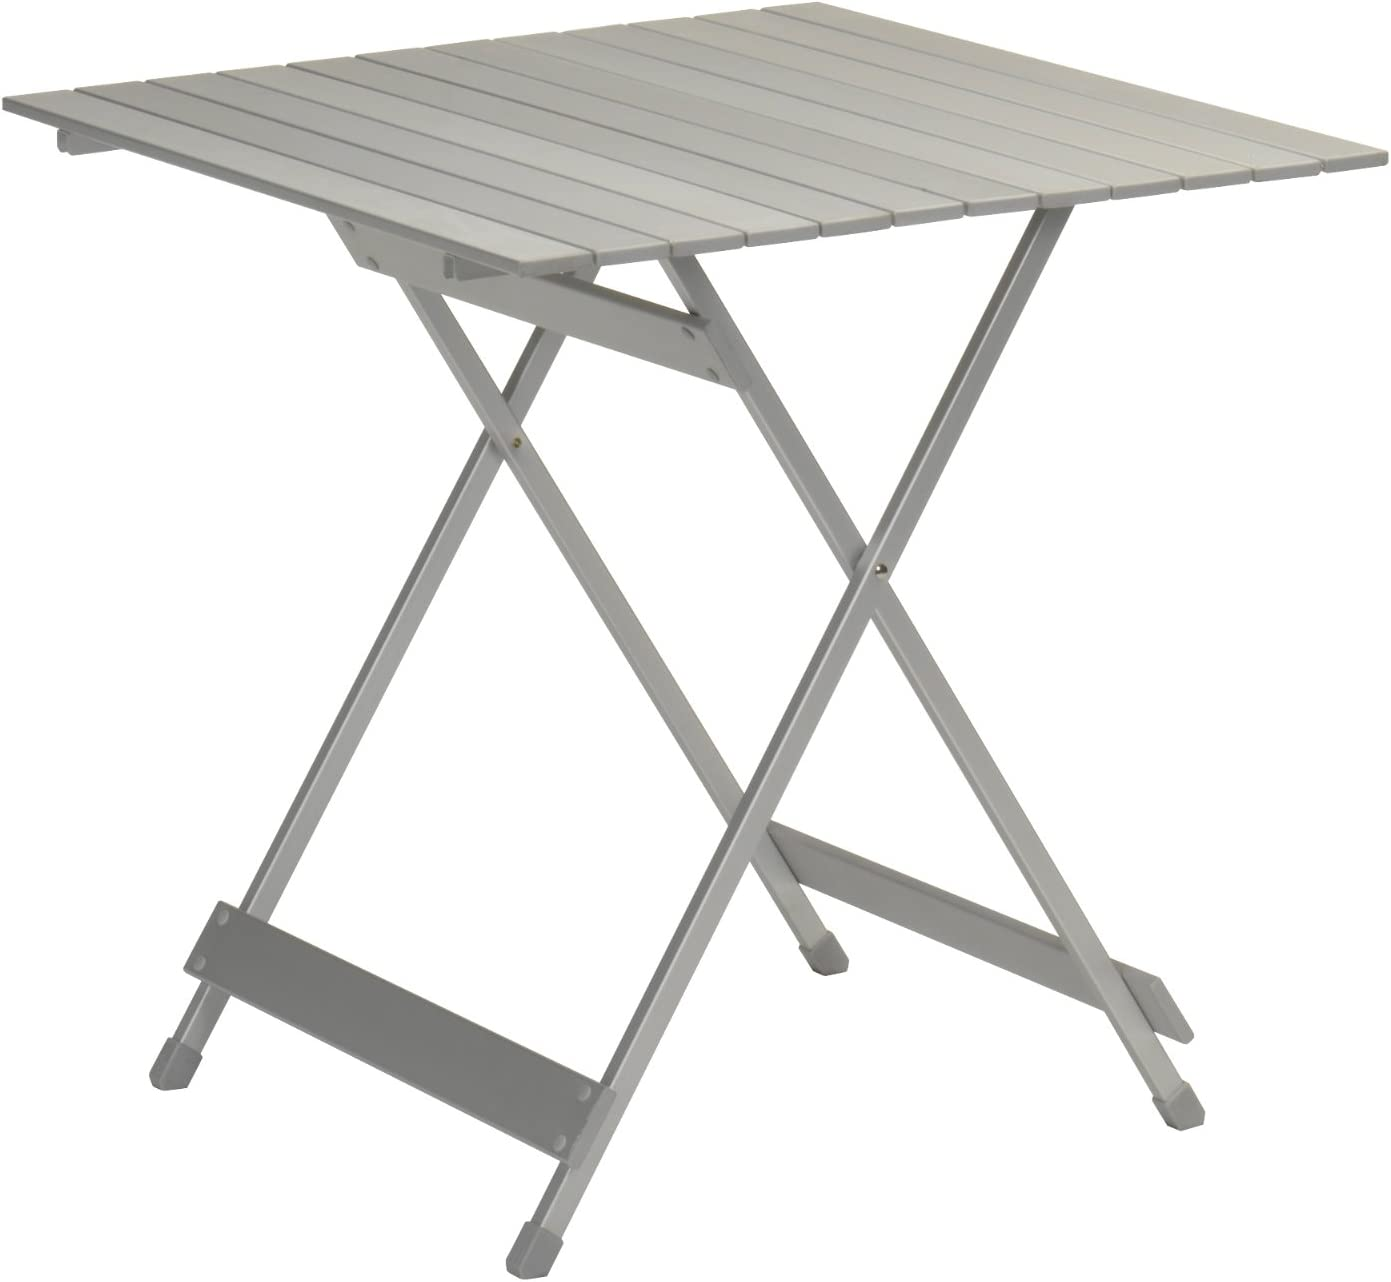 150 x 80 cm Mesa de camping Campart Travel TA-0795 Plegable Aluminio